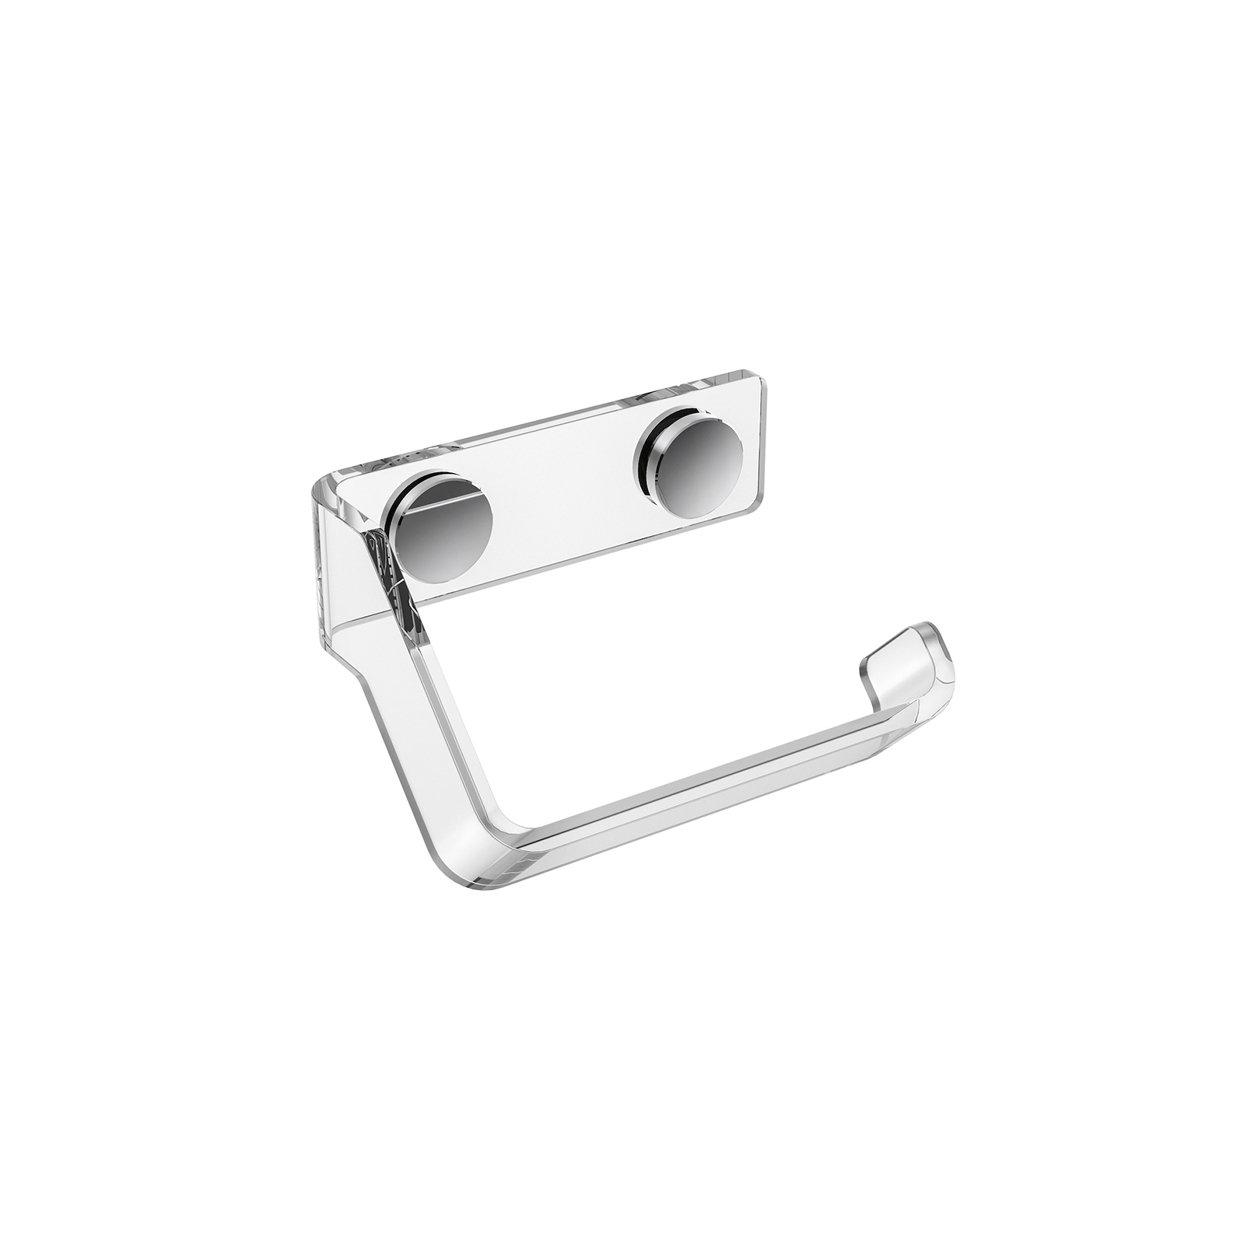 Porta Carta Igienica Originali air portacarta destro porta rotolo carta igienica destro in plexiglass -  lucesolida